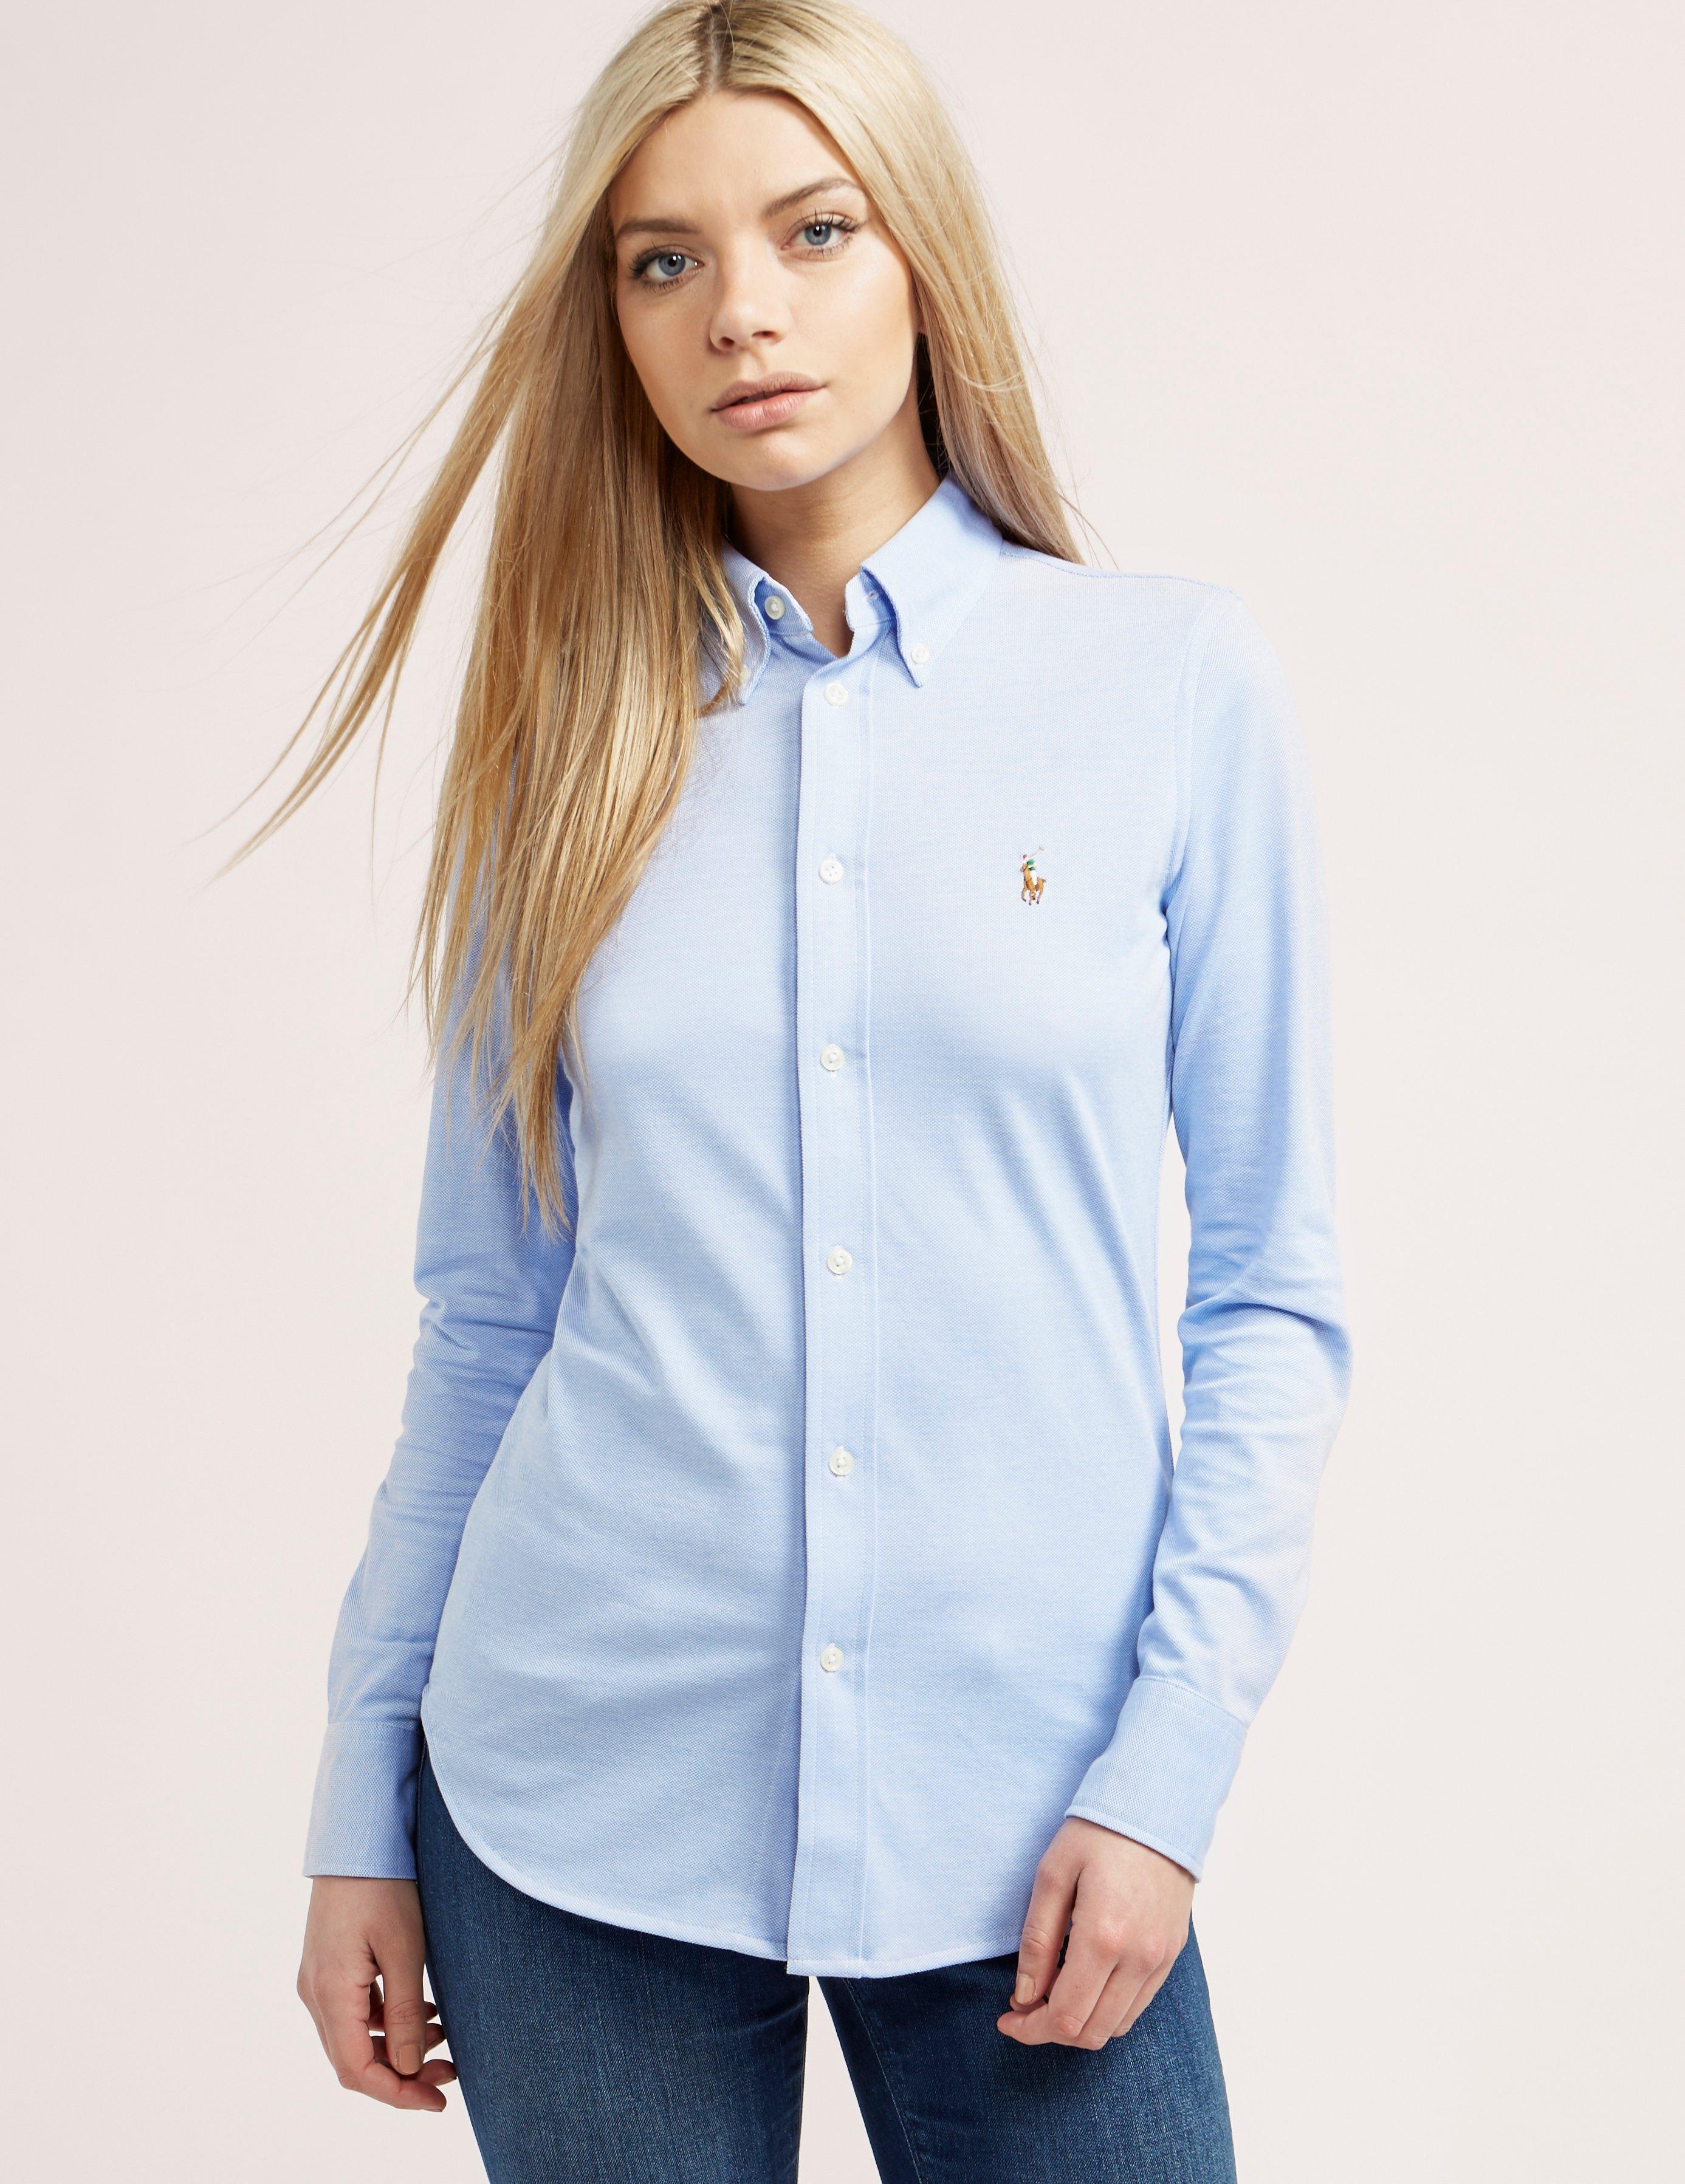 Lyst - Polo Ralph Lauren Womens Oxford Shirt Blue in Blue 21ef9a8a5c2e